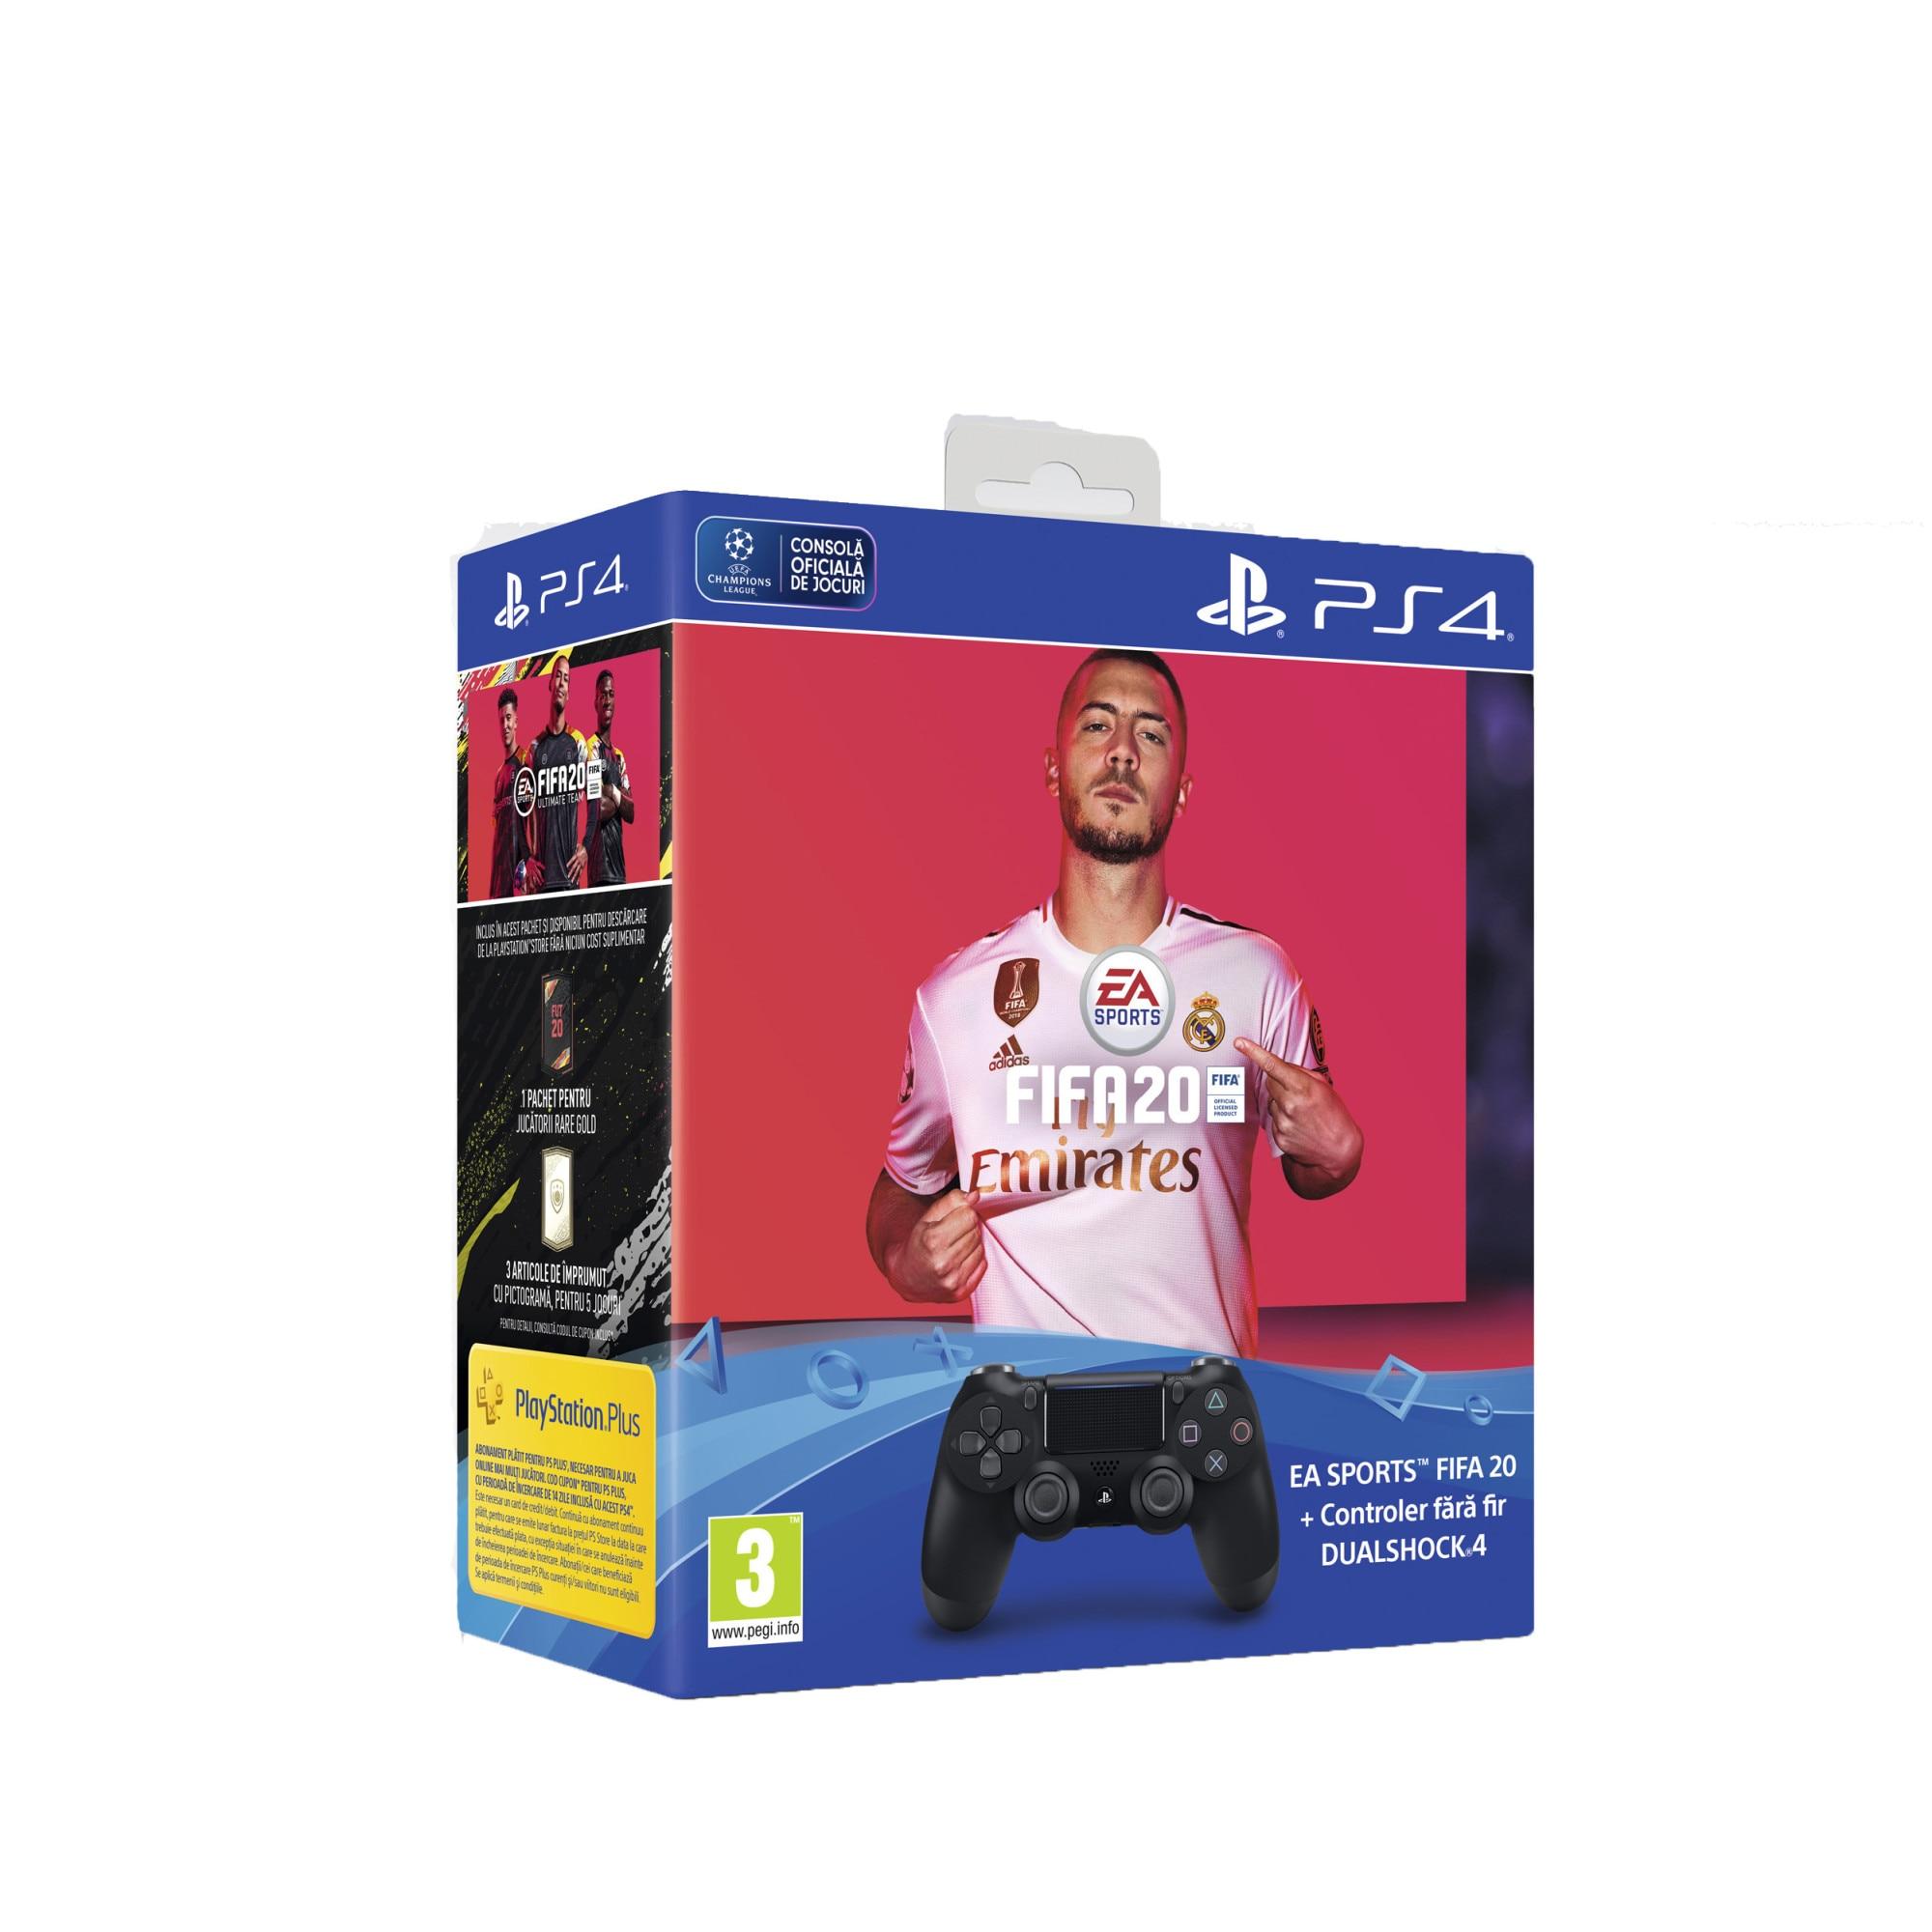 Fotografie Controller Sony PlayStation DualShock 4 v2, Negru + Joc FIFA 20 pentru PlayStation 4